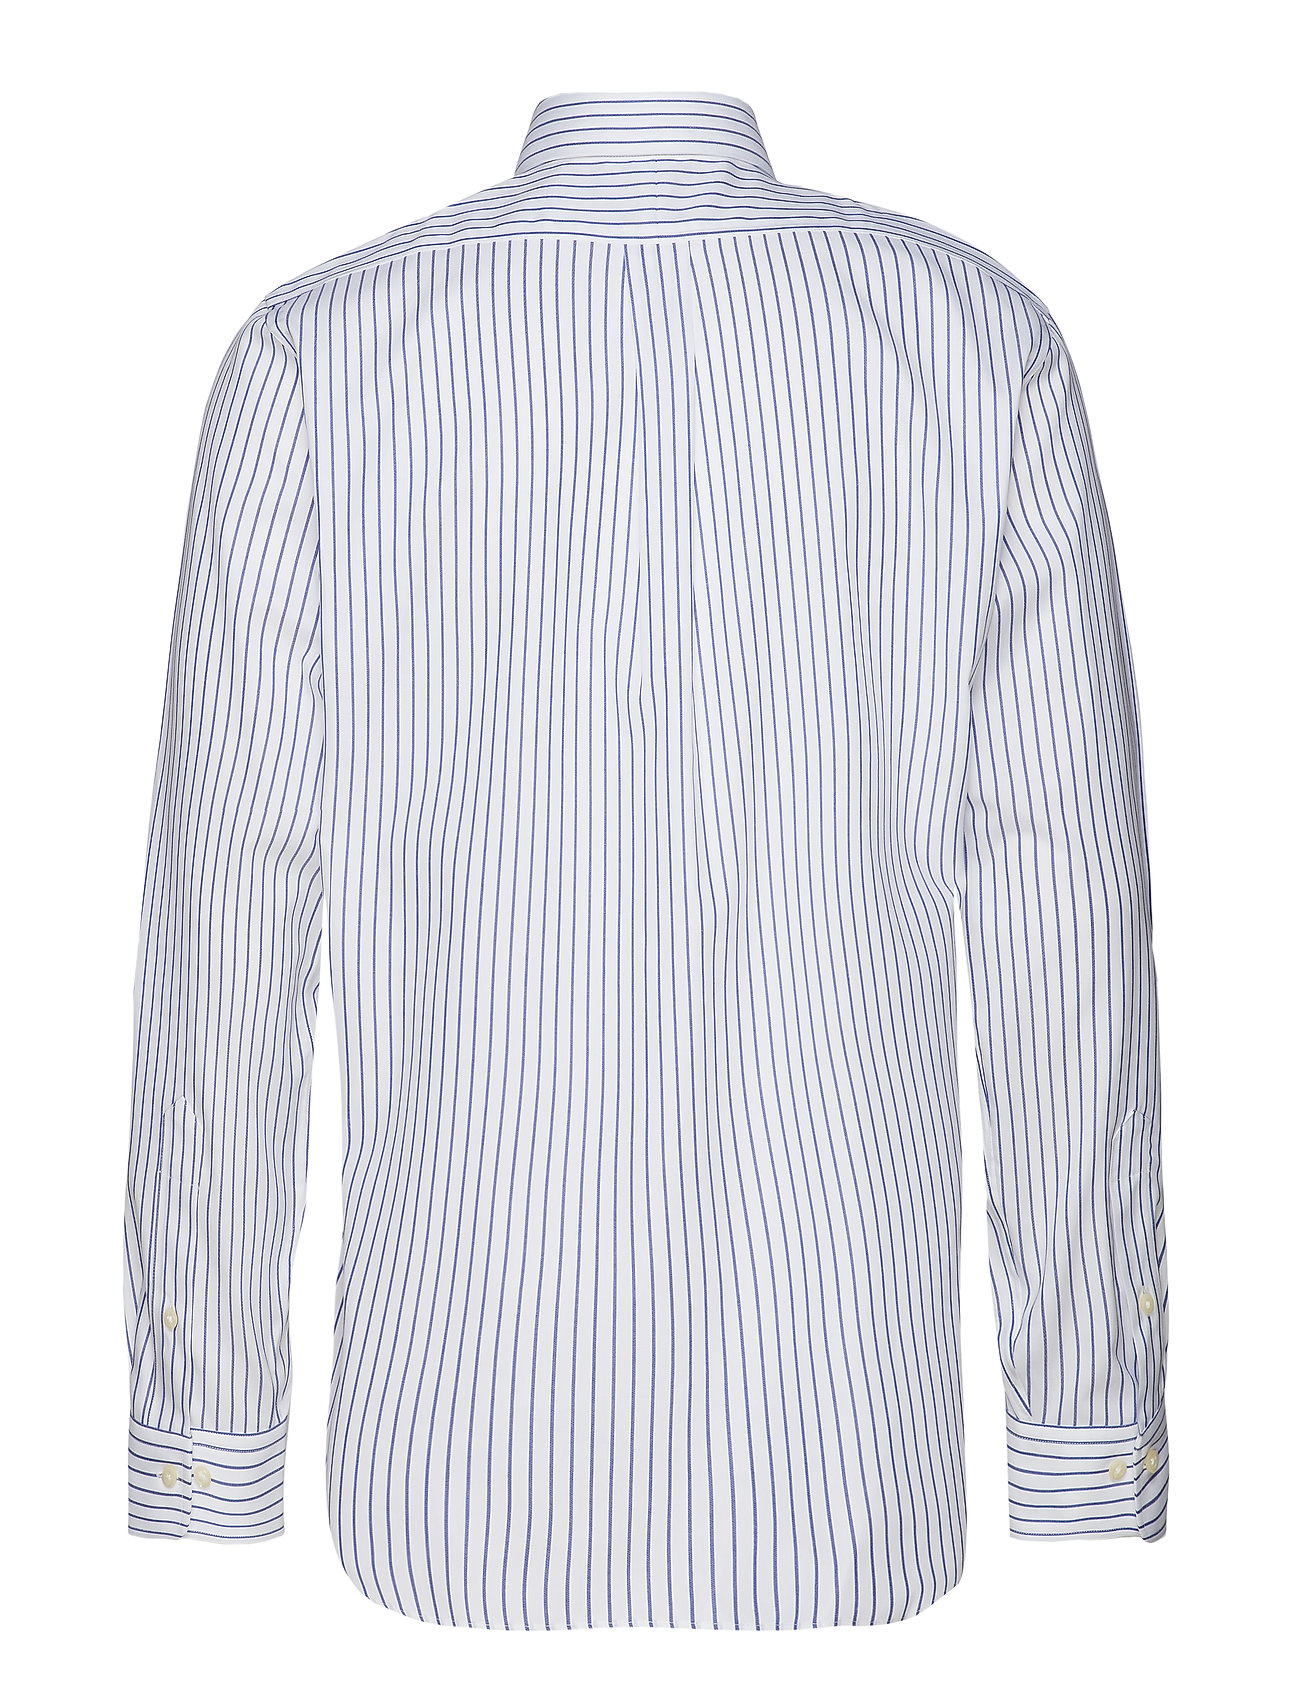 Classic whitePolo Lauren Shirt3393a Ralph Fit Blue Easy Care c3ARjS54Lq